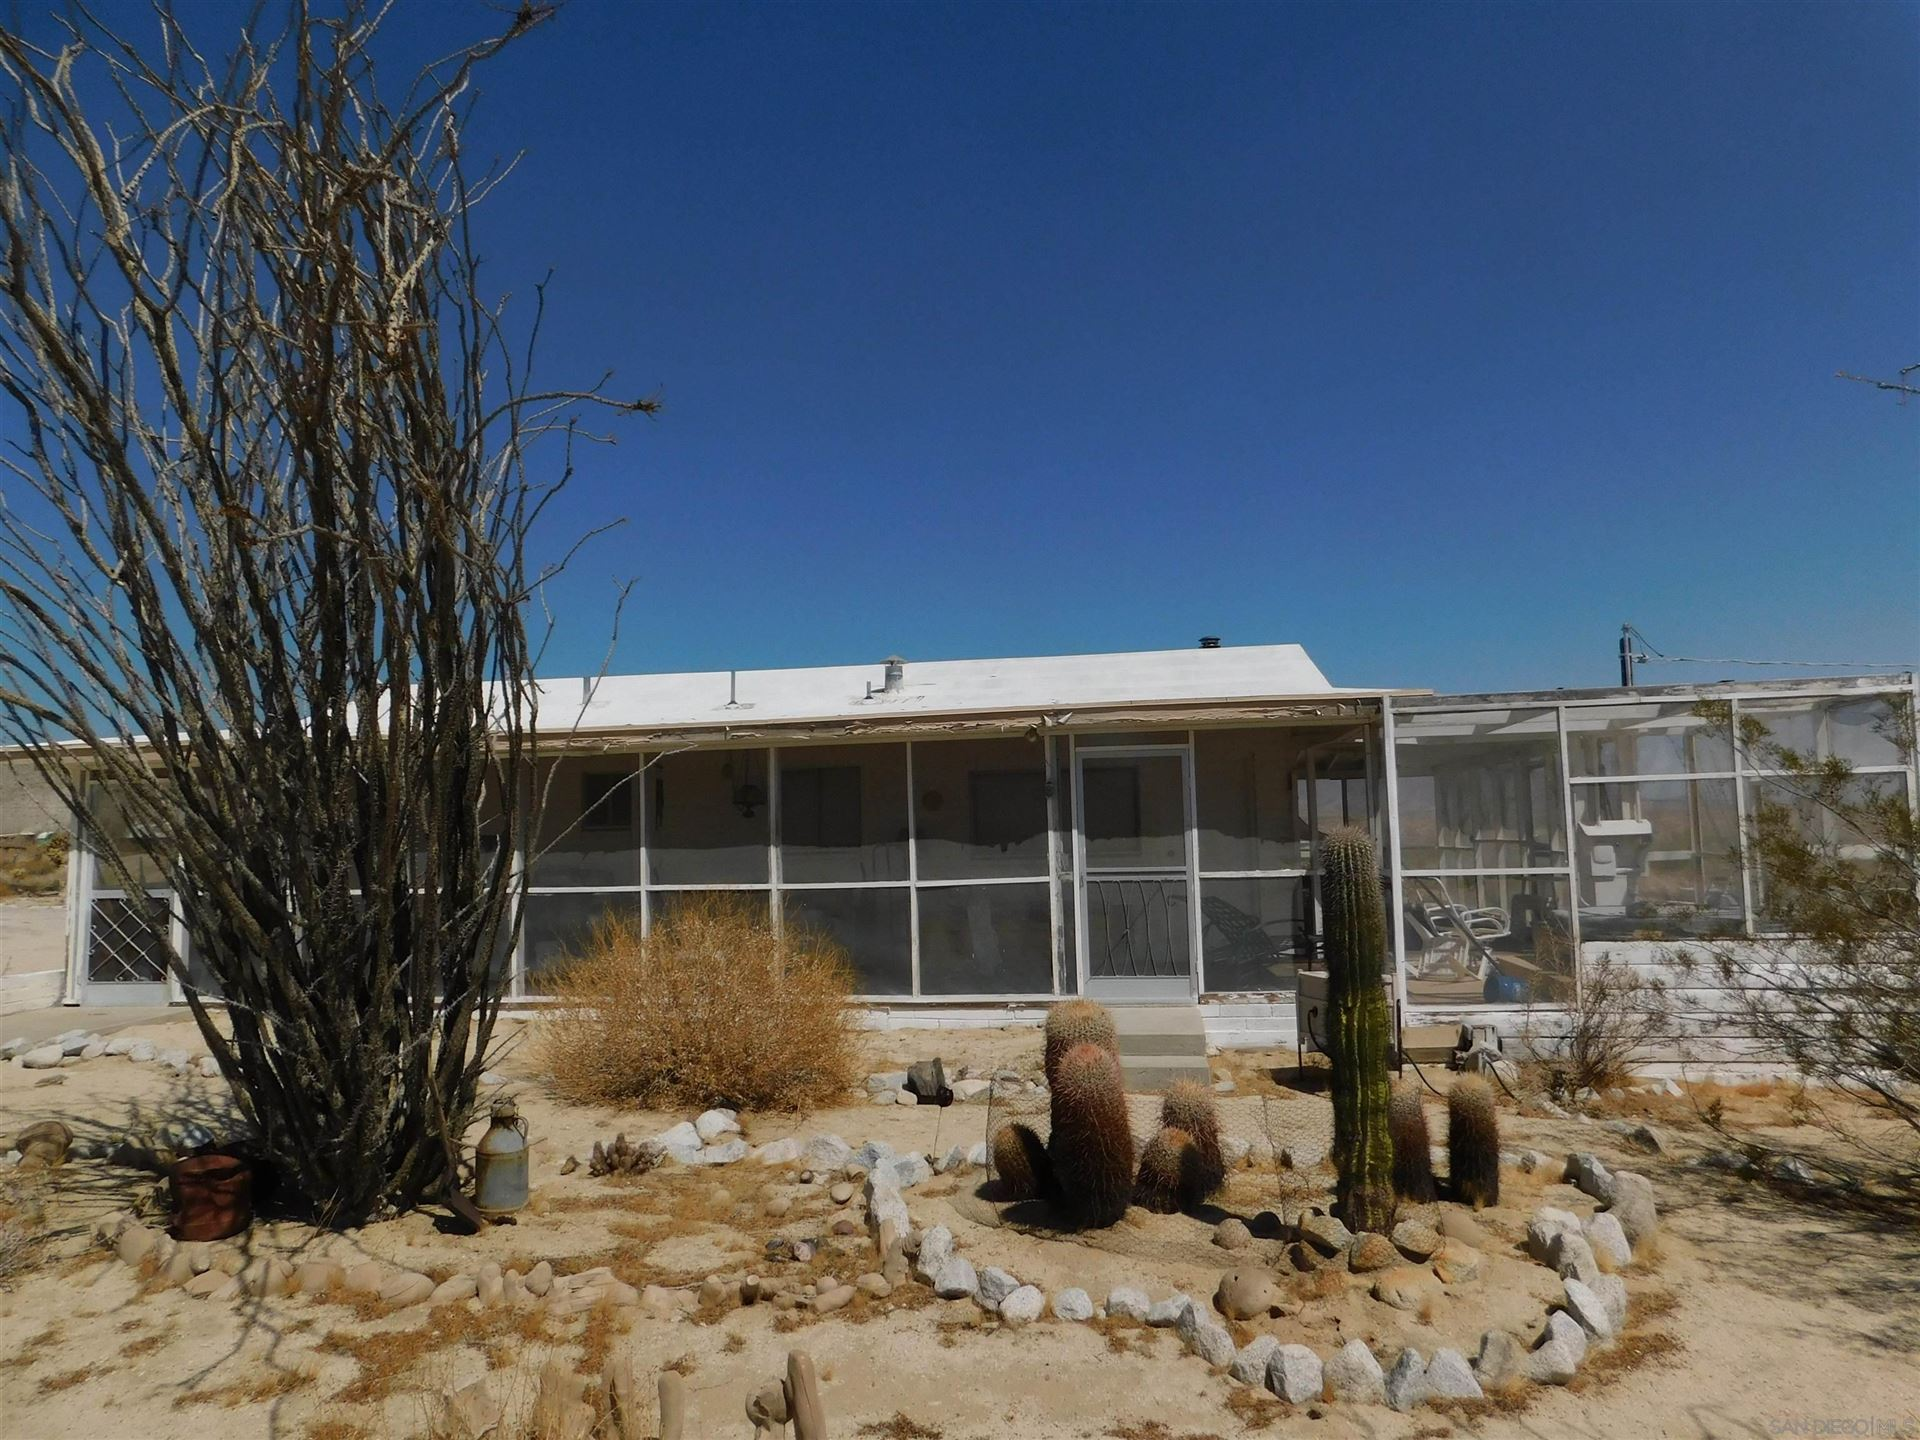 Photo of 475 Canebrake Rd, Julian, CA 92036 (MLS # 210026177)